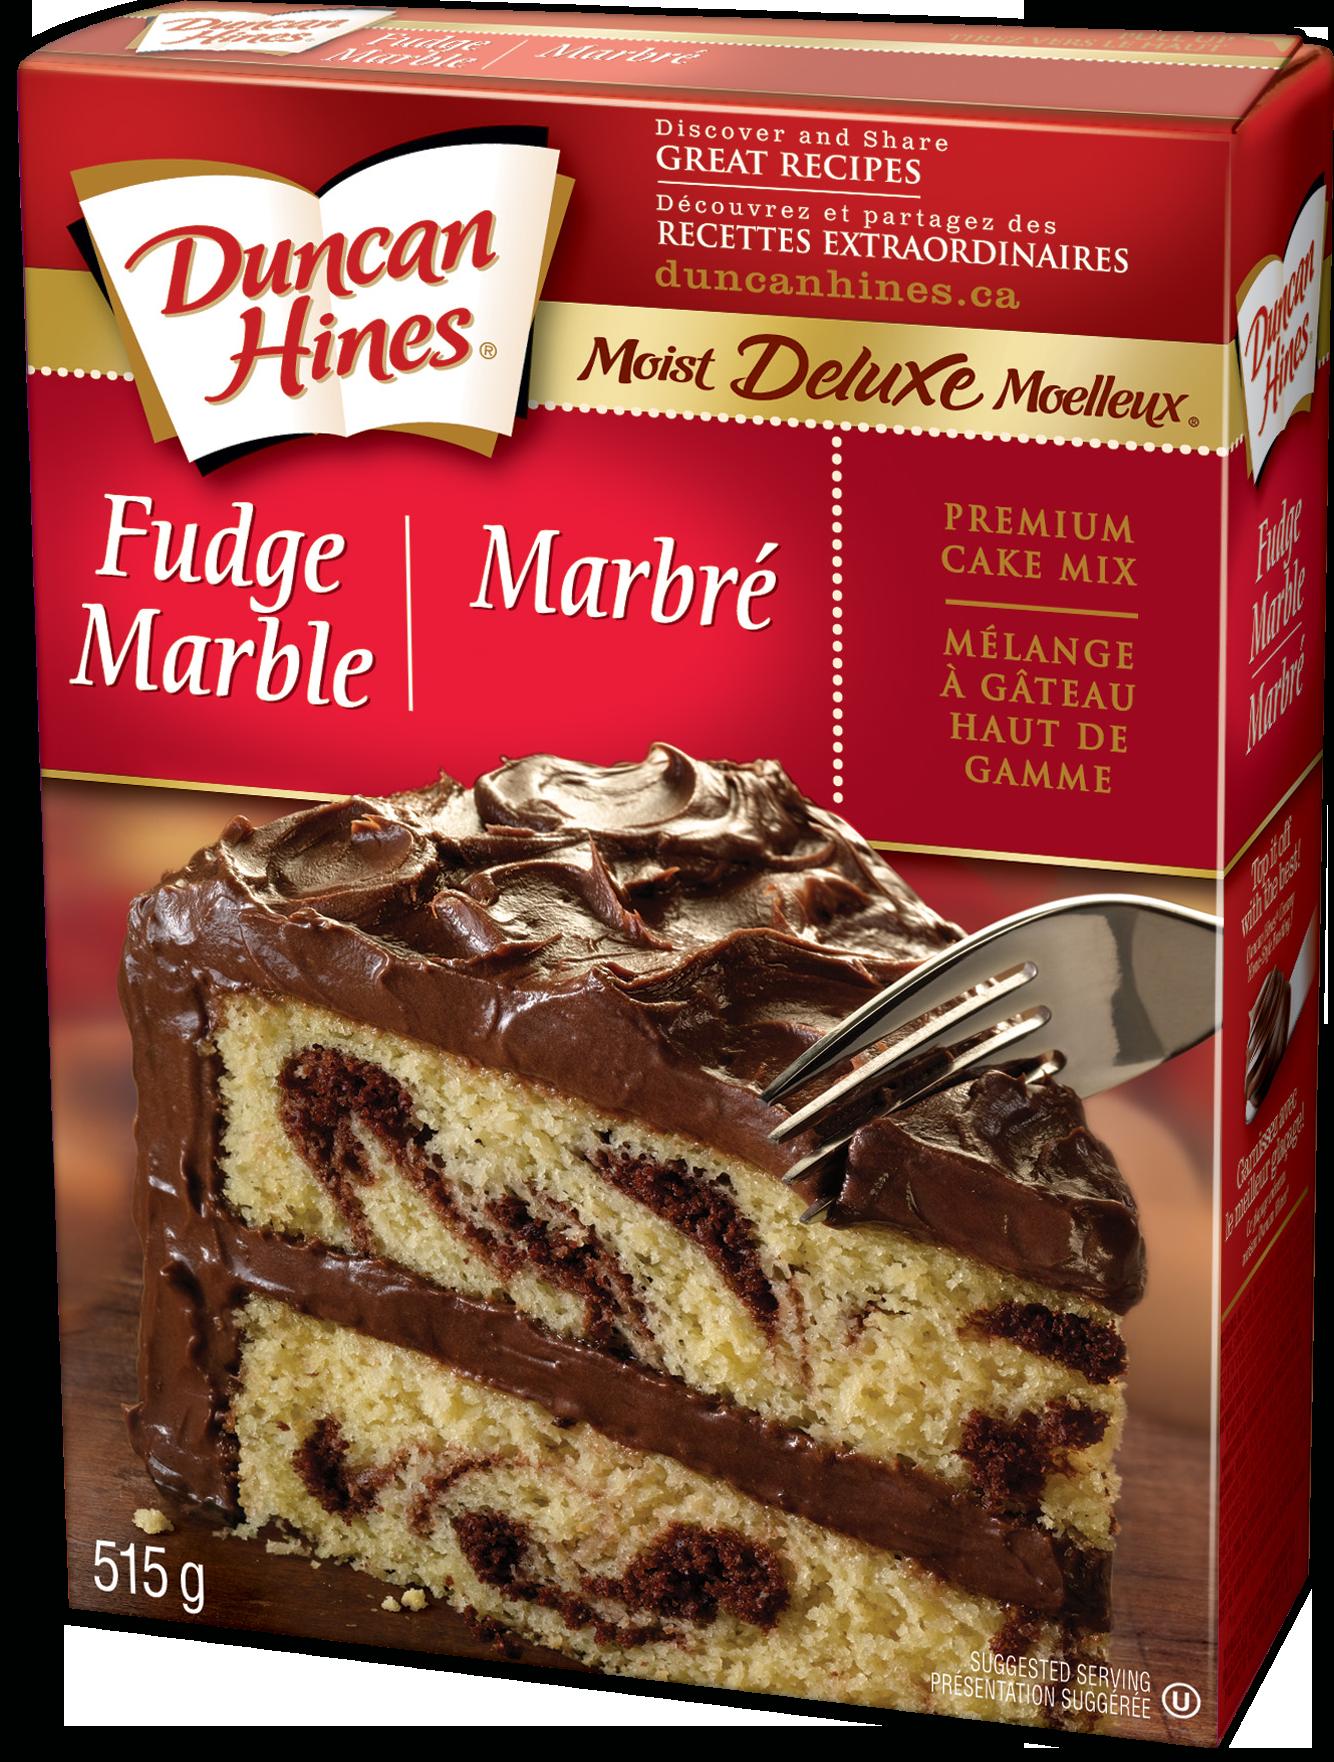 Product Fudge Marble Cake Mix Marble Cake Recipes Cake Recipes Fudge